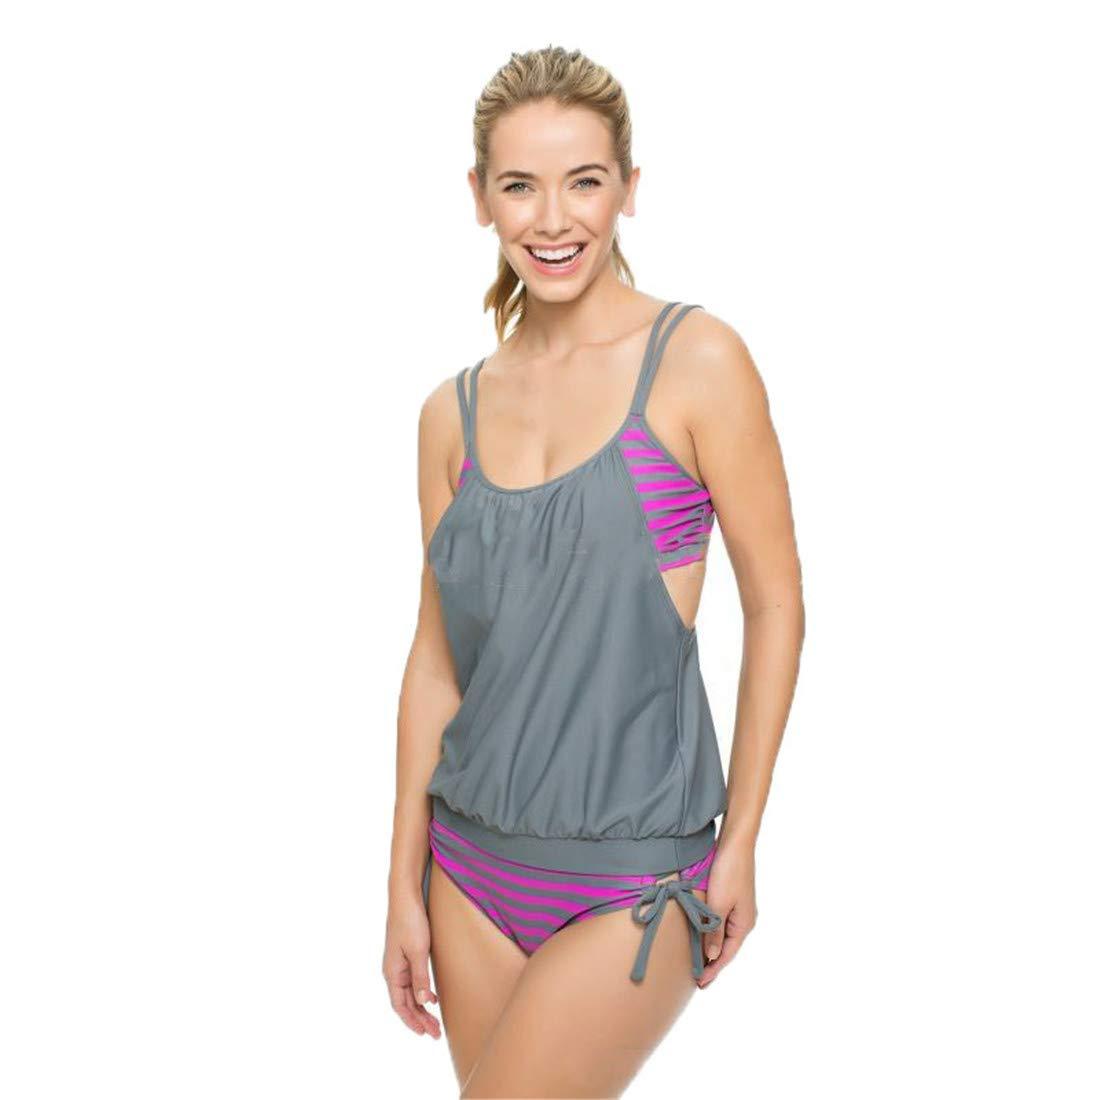 Qusanyua Swimsuit Female Bathing Suits Plus Size Two Piece Bikini Set Women Swimwear